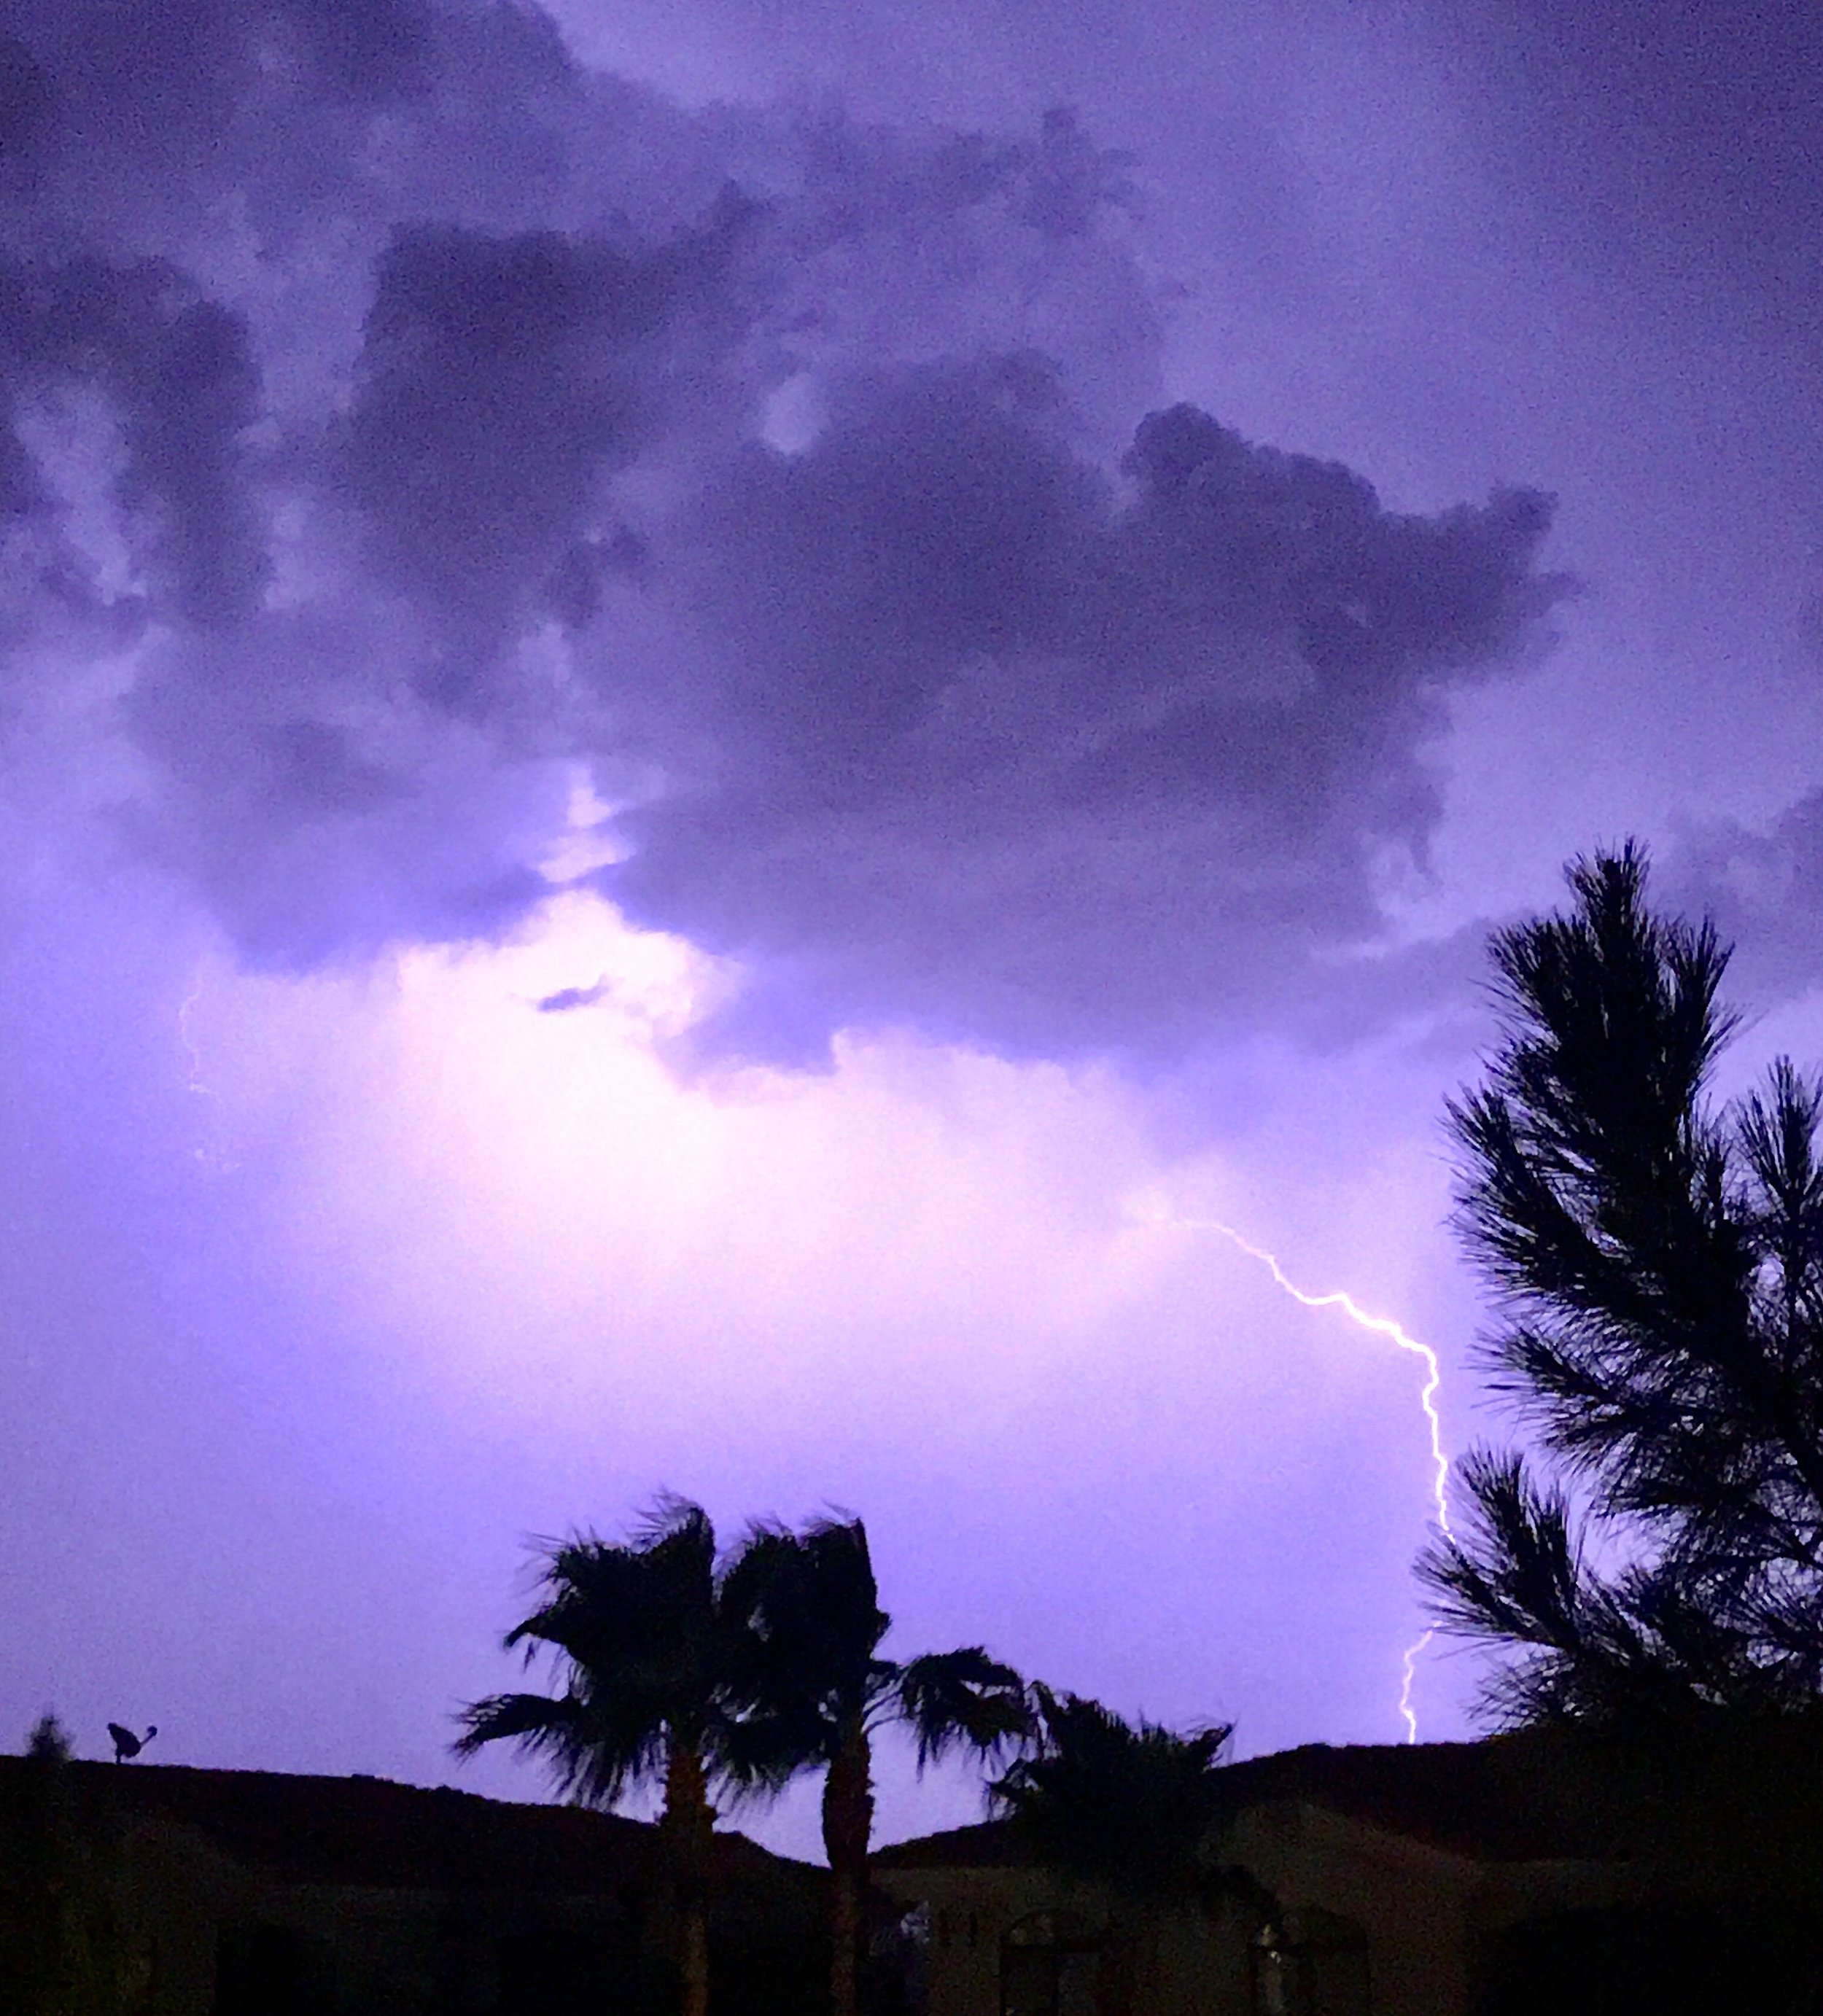 Lightning I caught during an evening monsoon shower